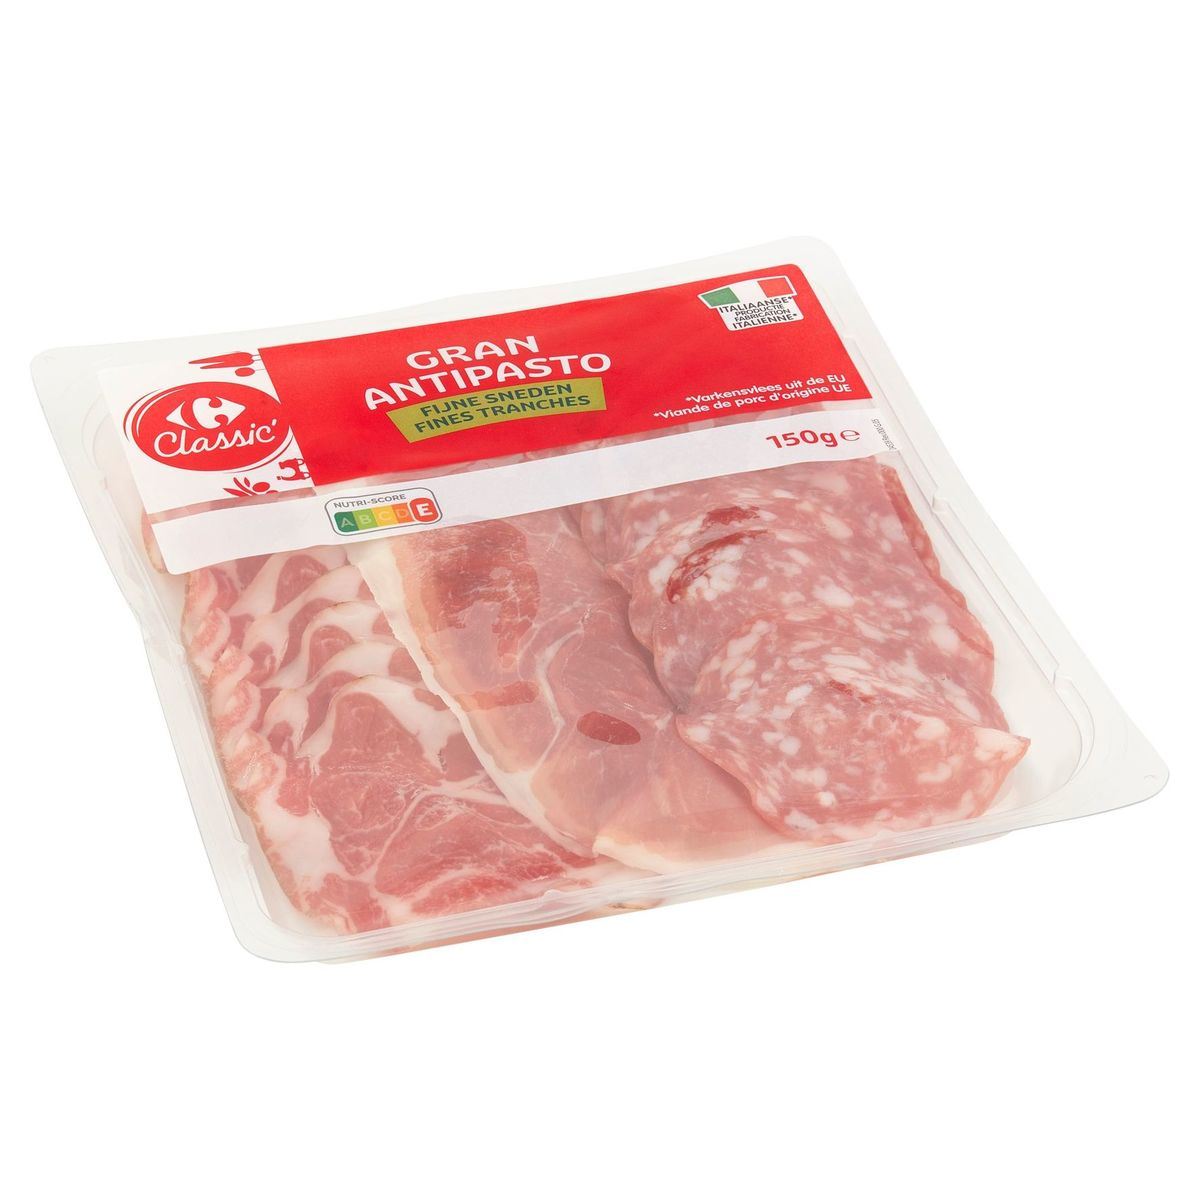 Carrefour Classic' Gran Antipasto Fijne Sneden 150 g